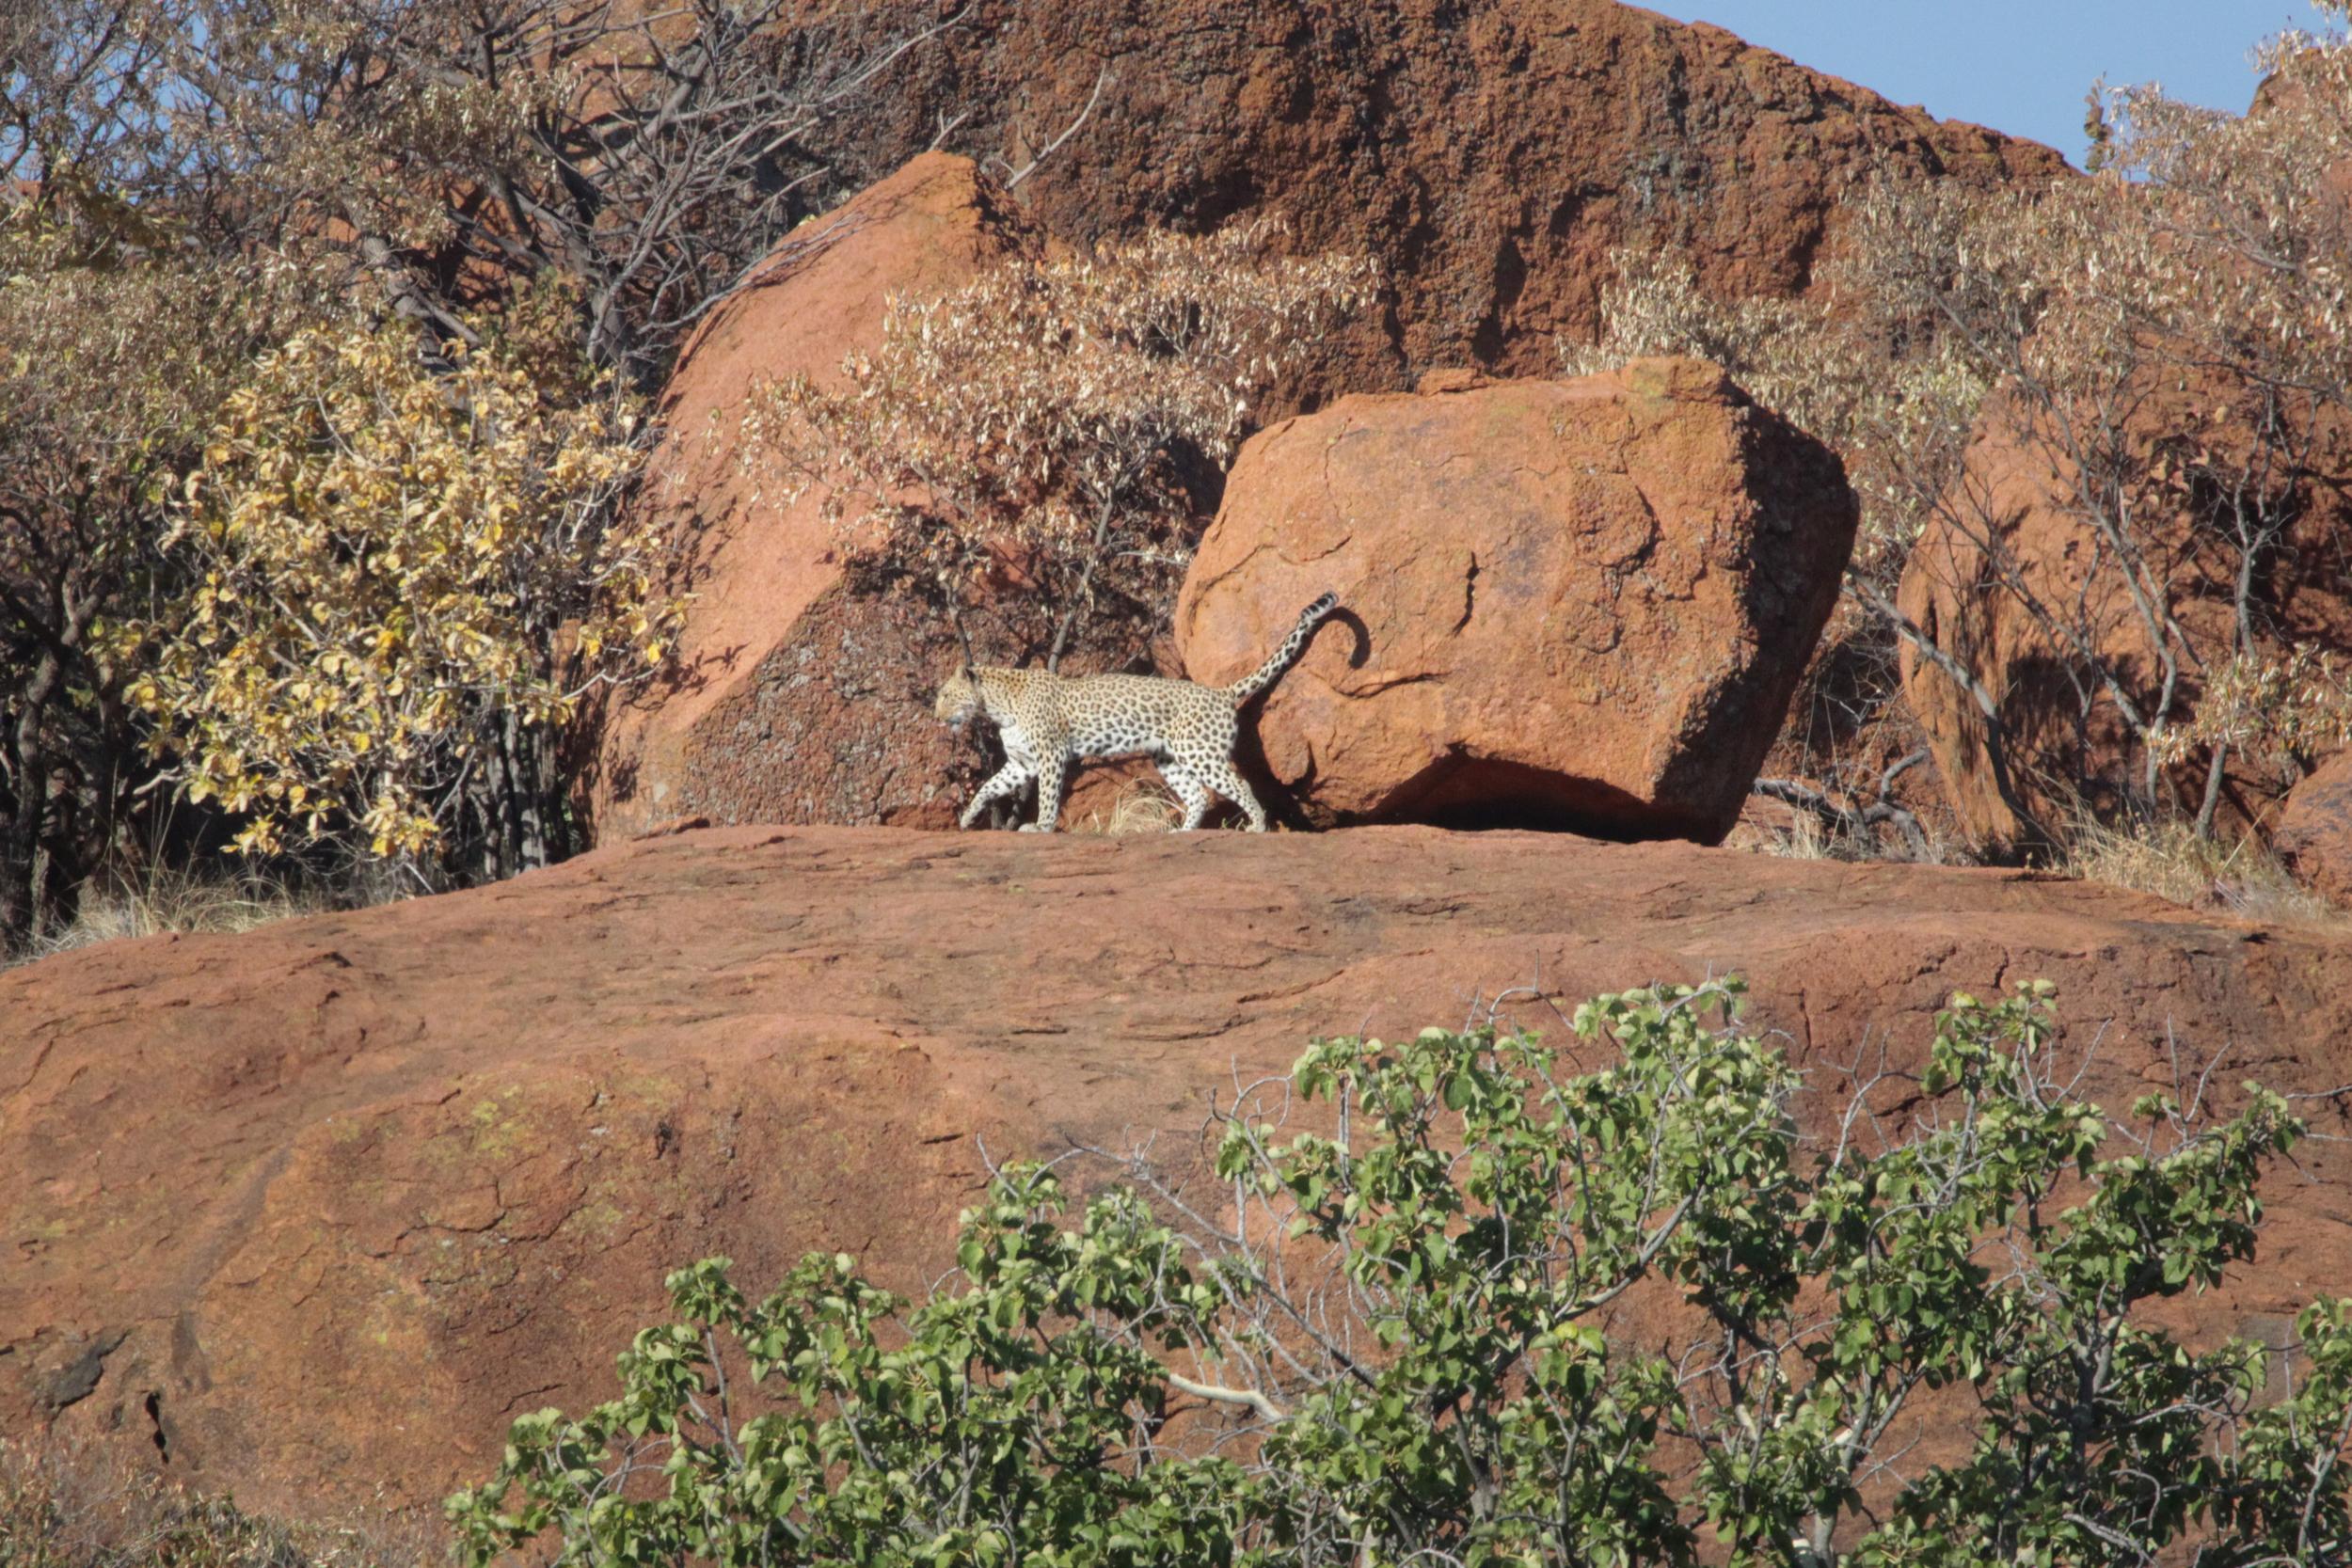 Momentary leopard sighting